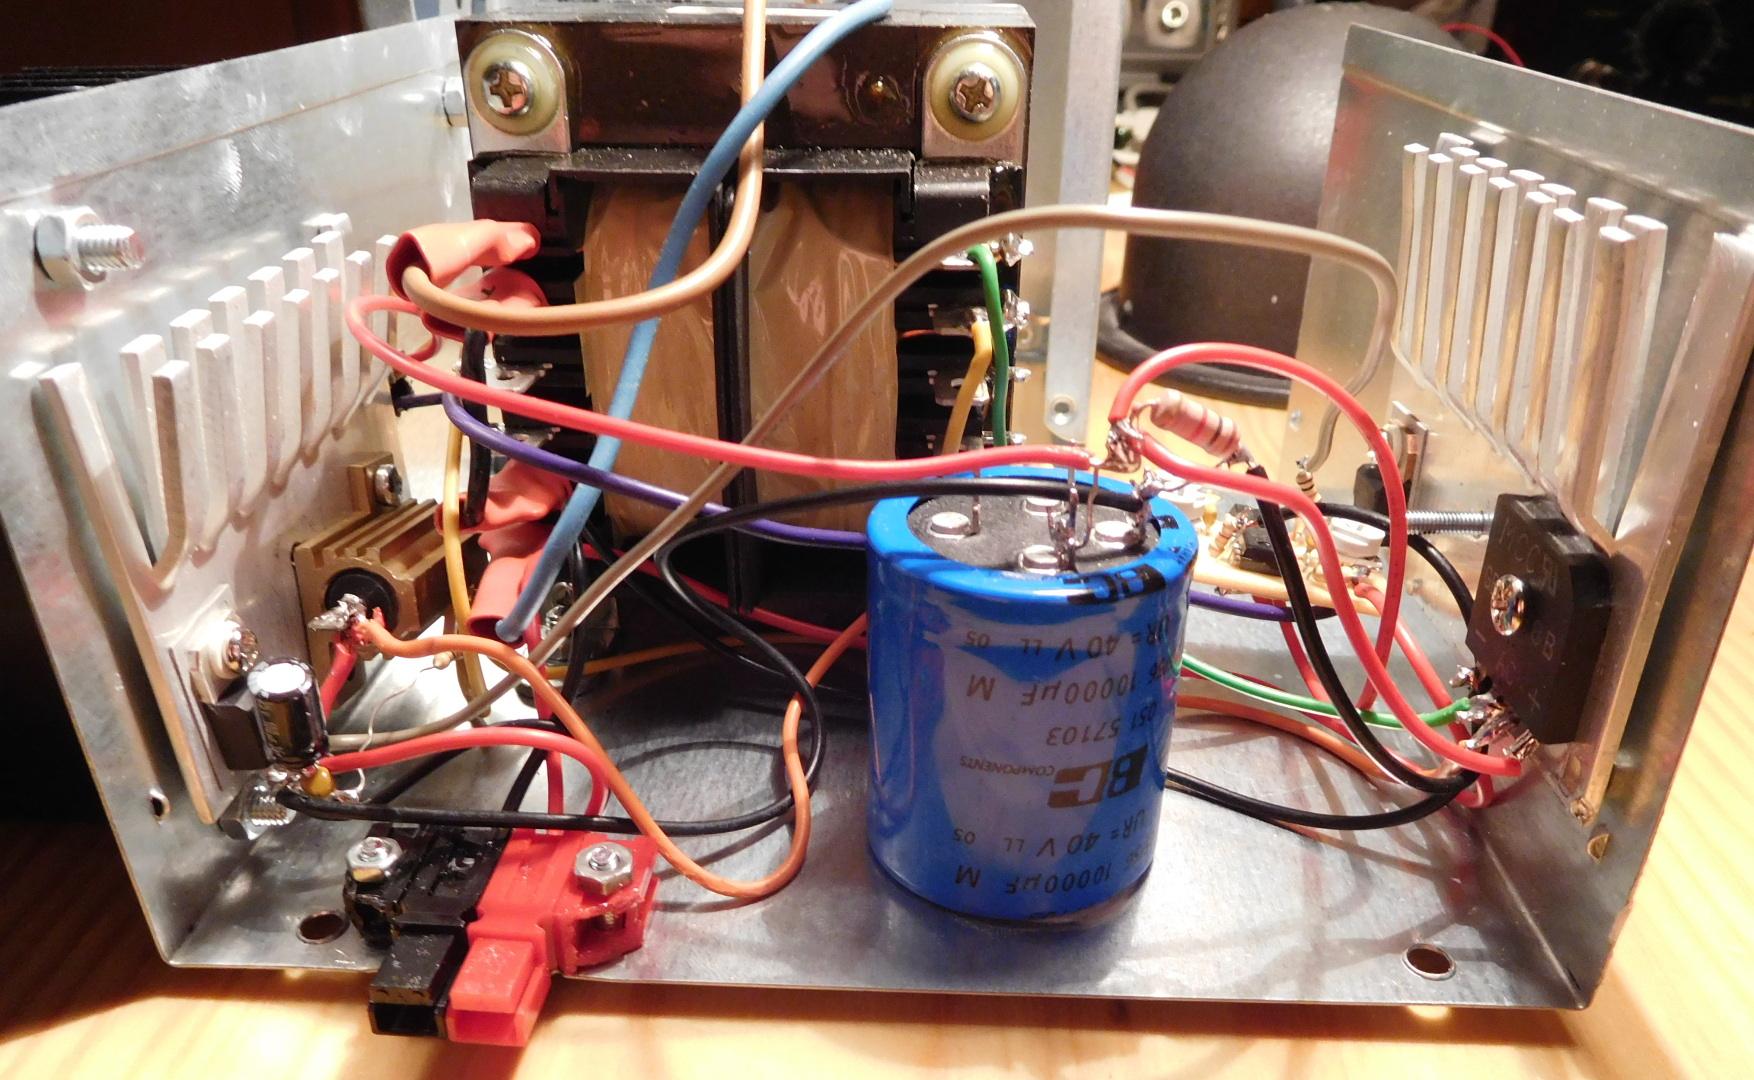 Linear 12V 5A power supply – Daniel Estévez